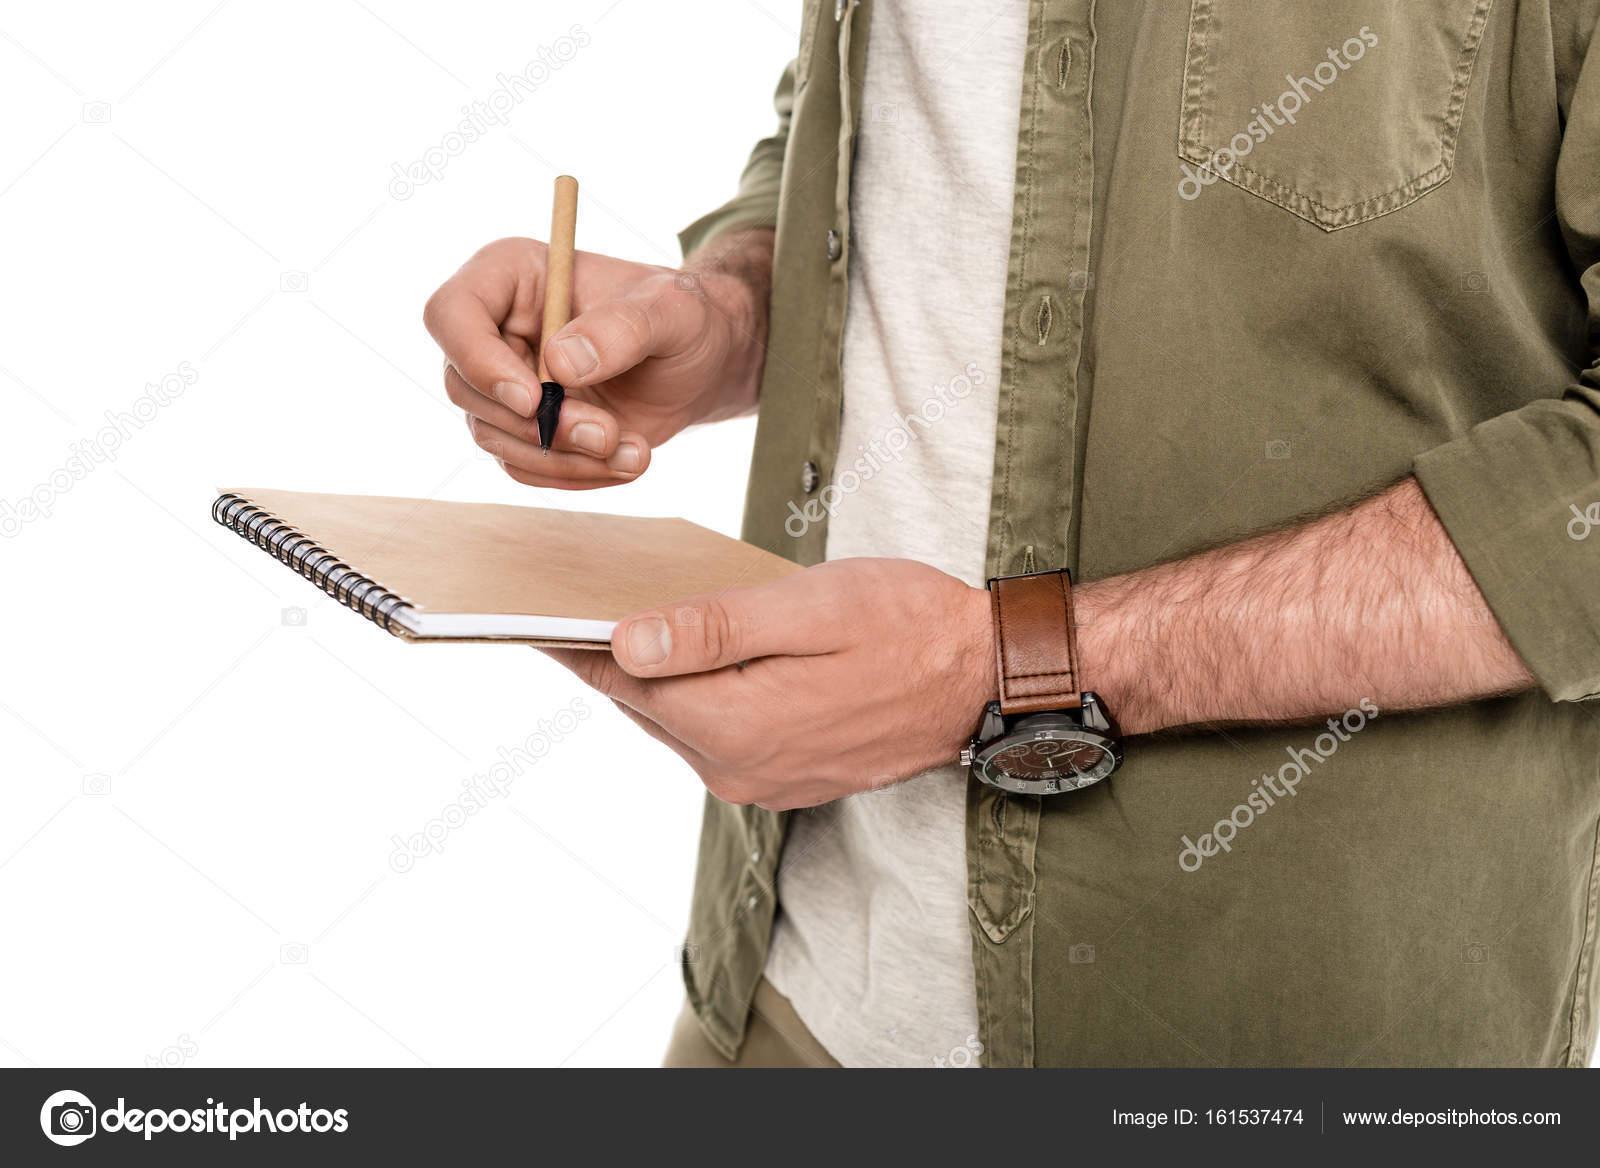 homme avec carnet et stylo en mains photographie igorvetushko 161537474. Black Bedroom Furniture Sets. Home Design Ideas